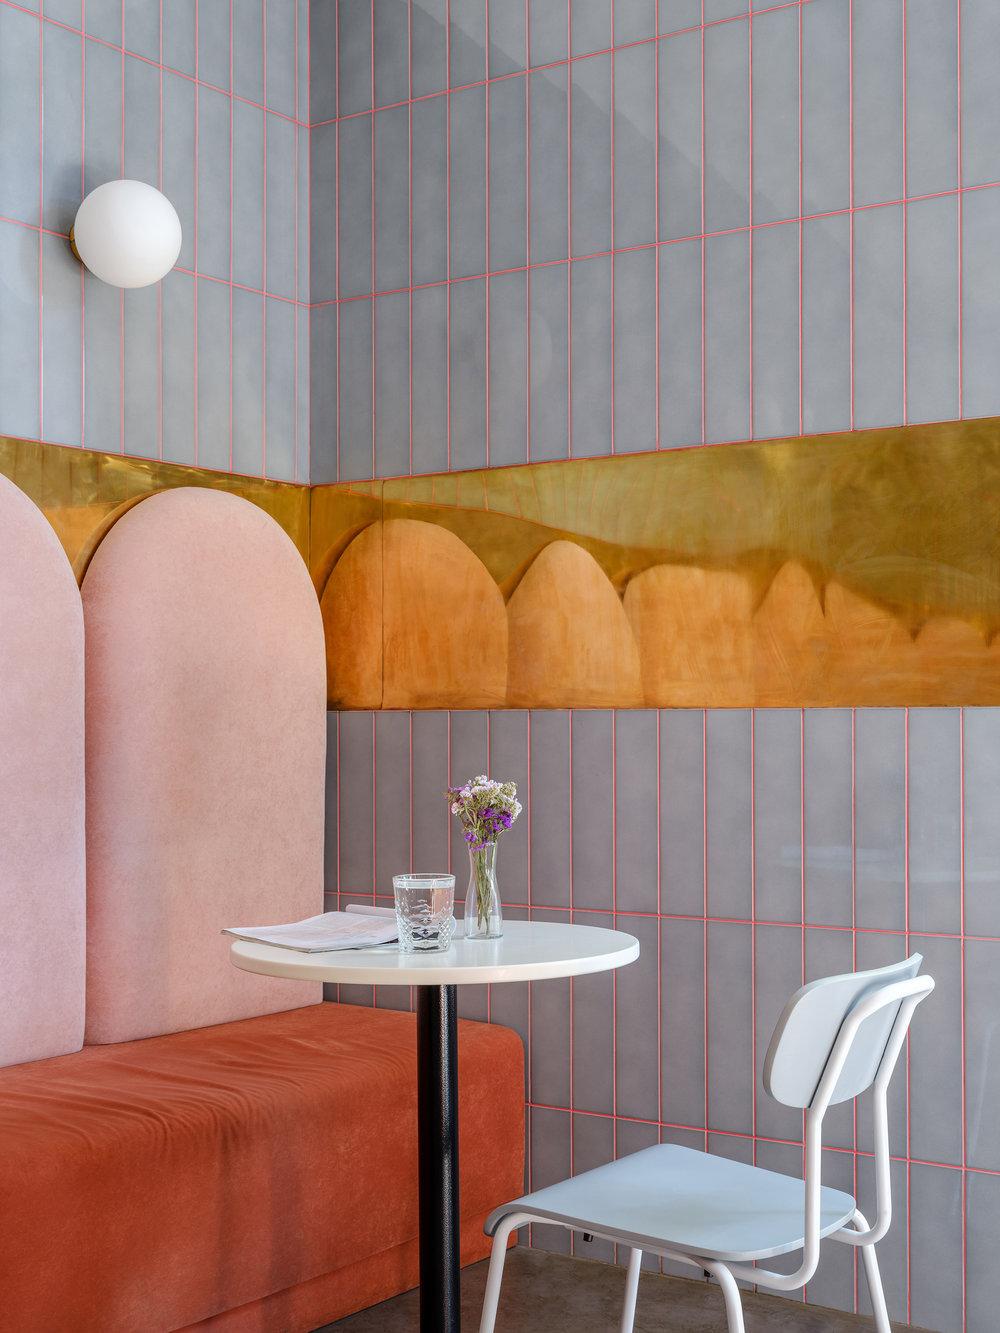 Breadway bakery Odessa Ukraine Artem Trigubchak Lera Brumina pink